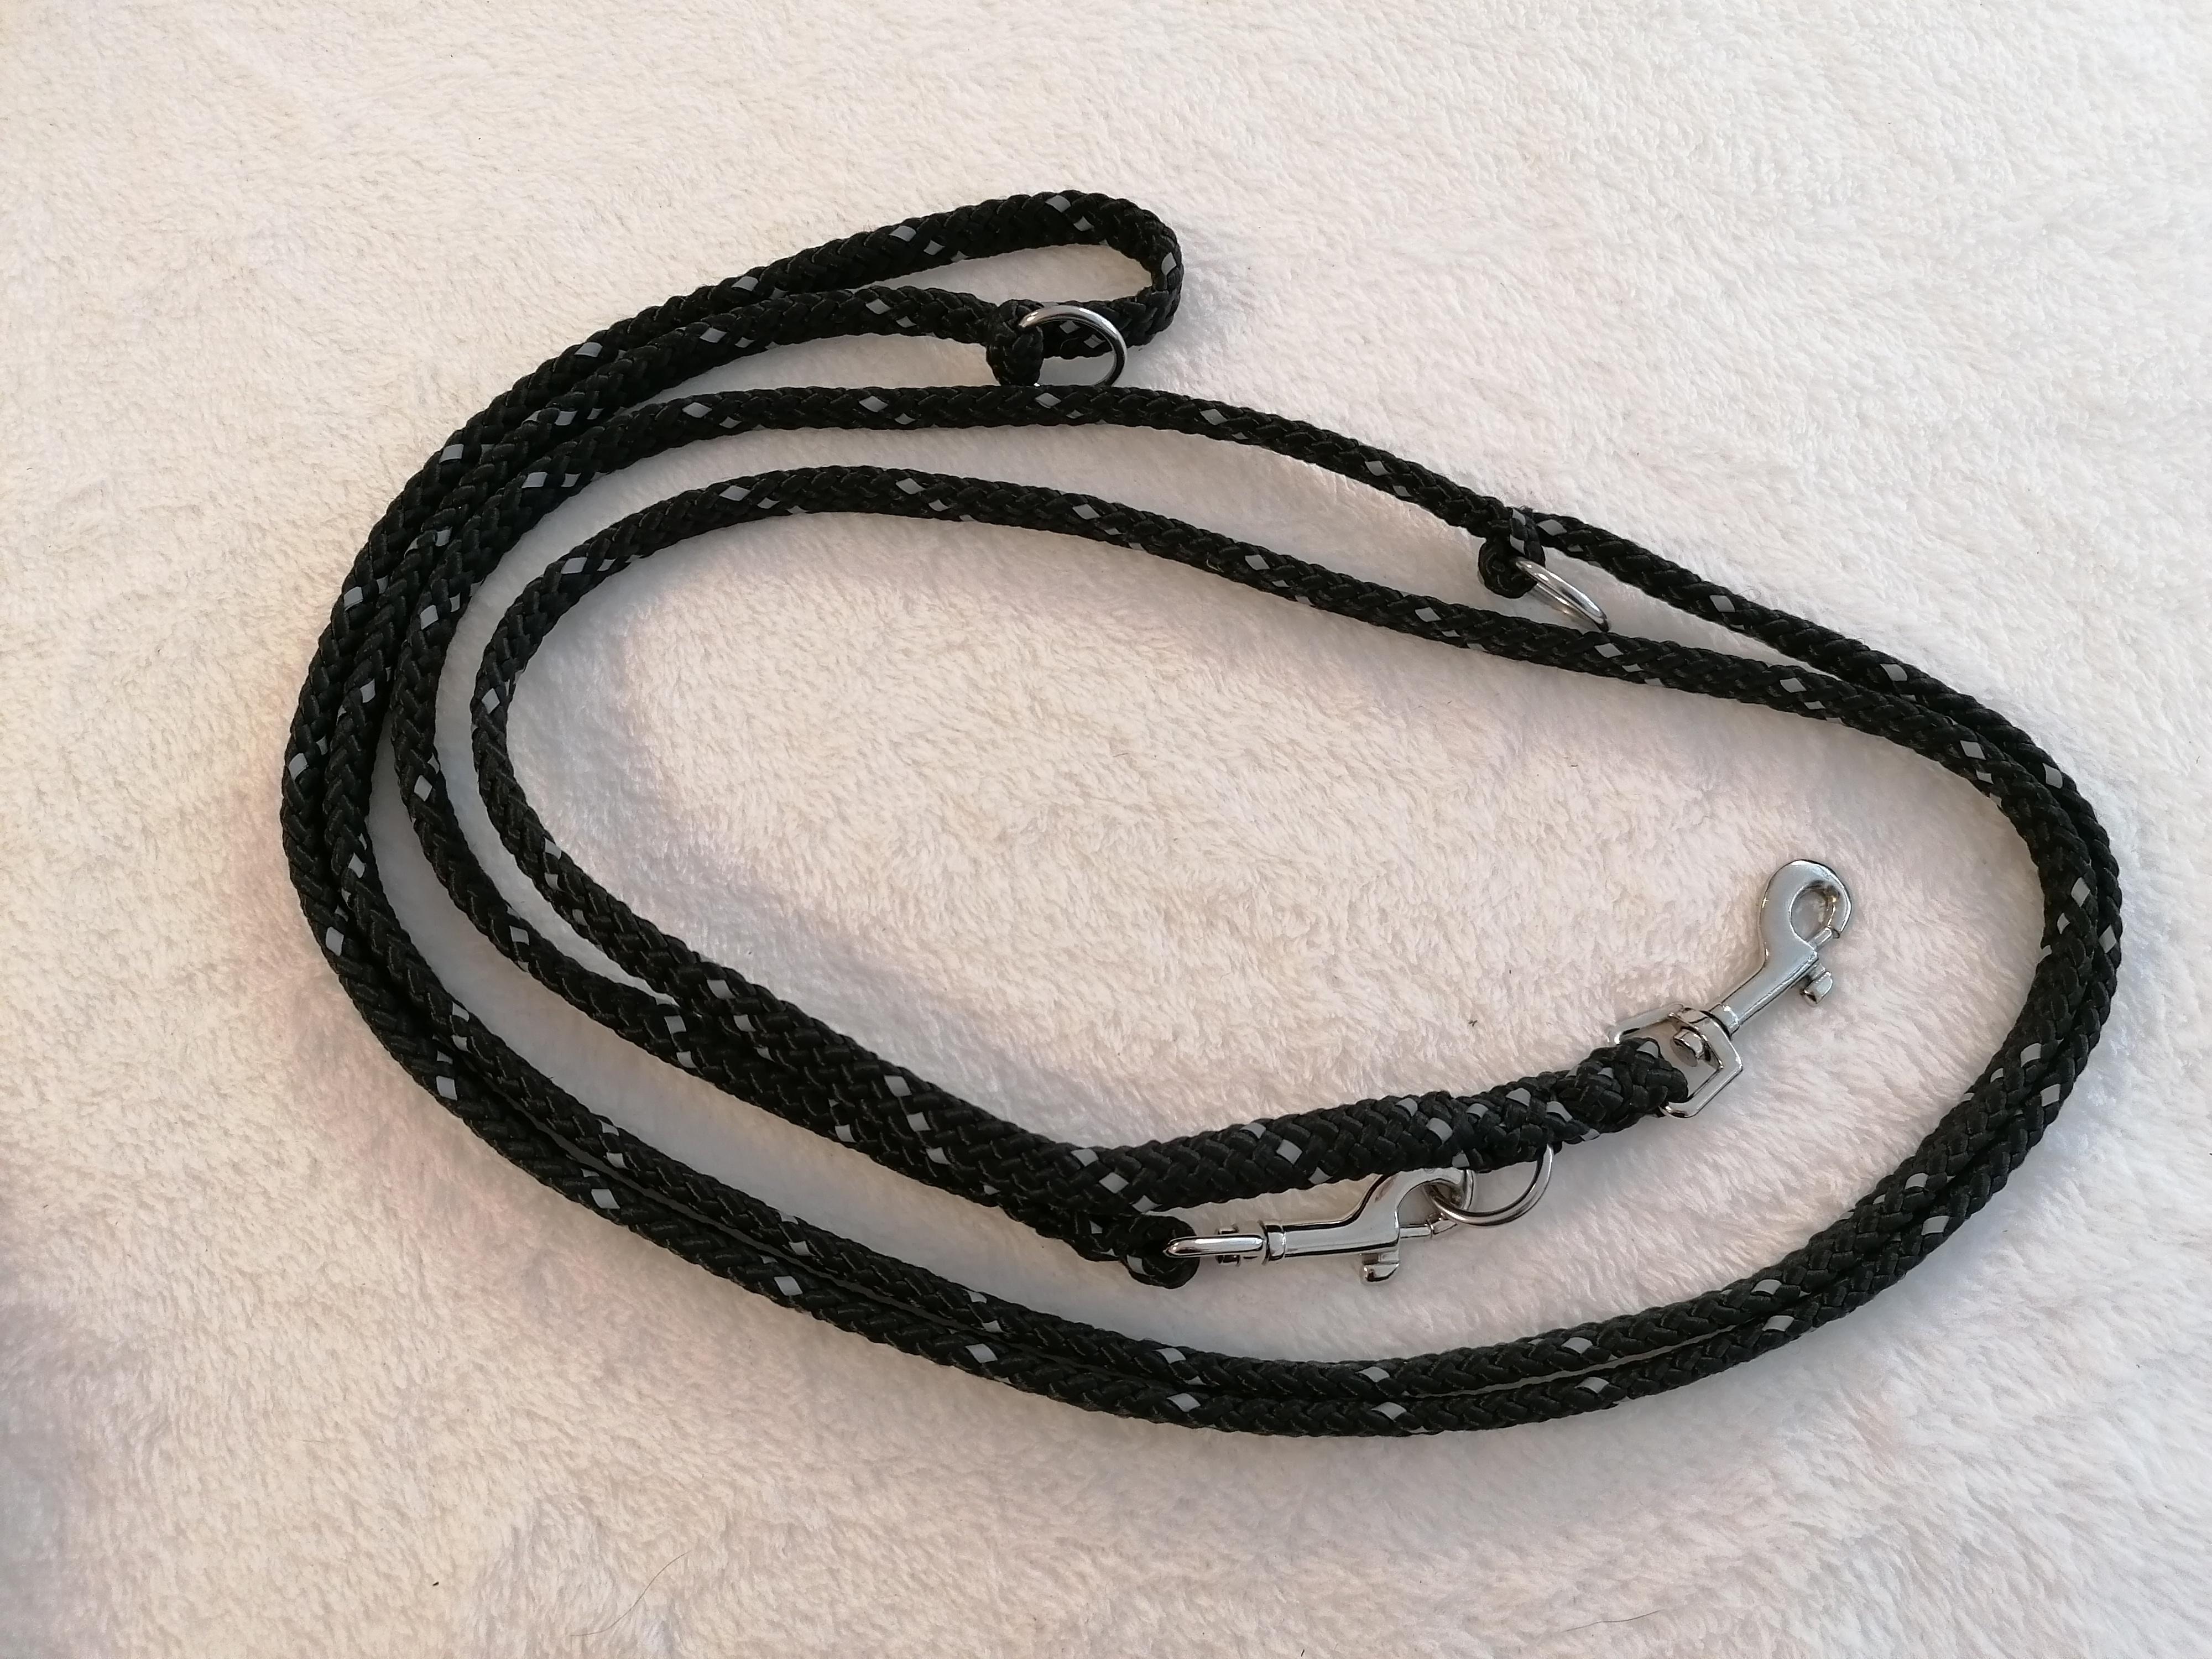 ProSafe gespleißte Hundeleine, 3fach verstellbar, 8mm